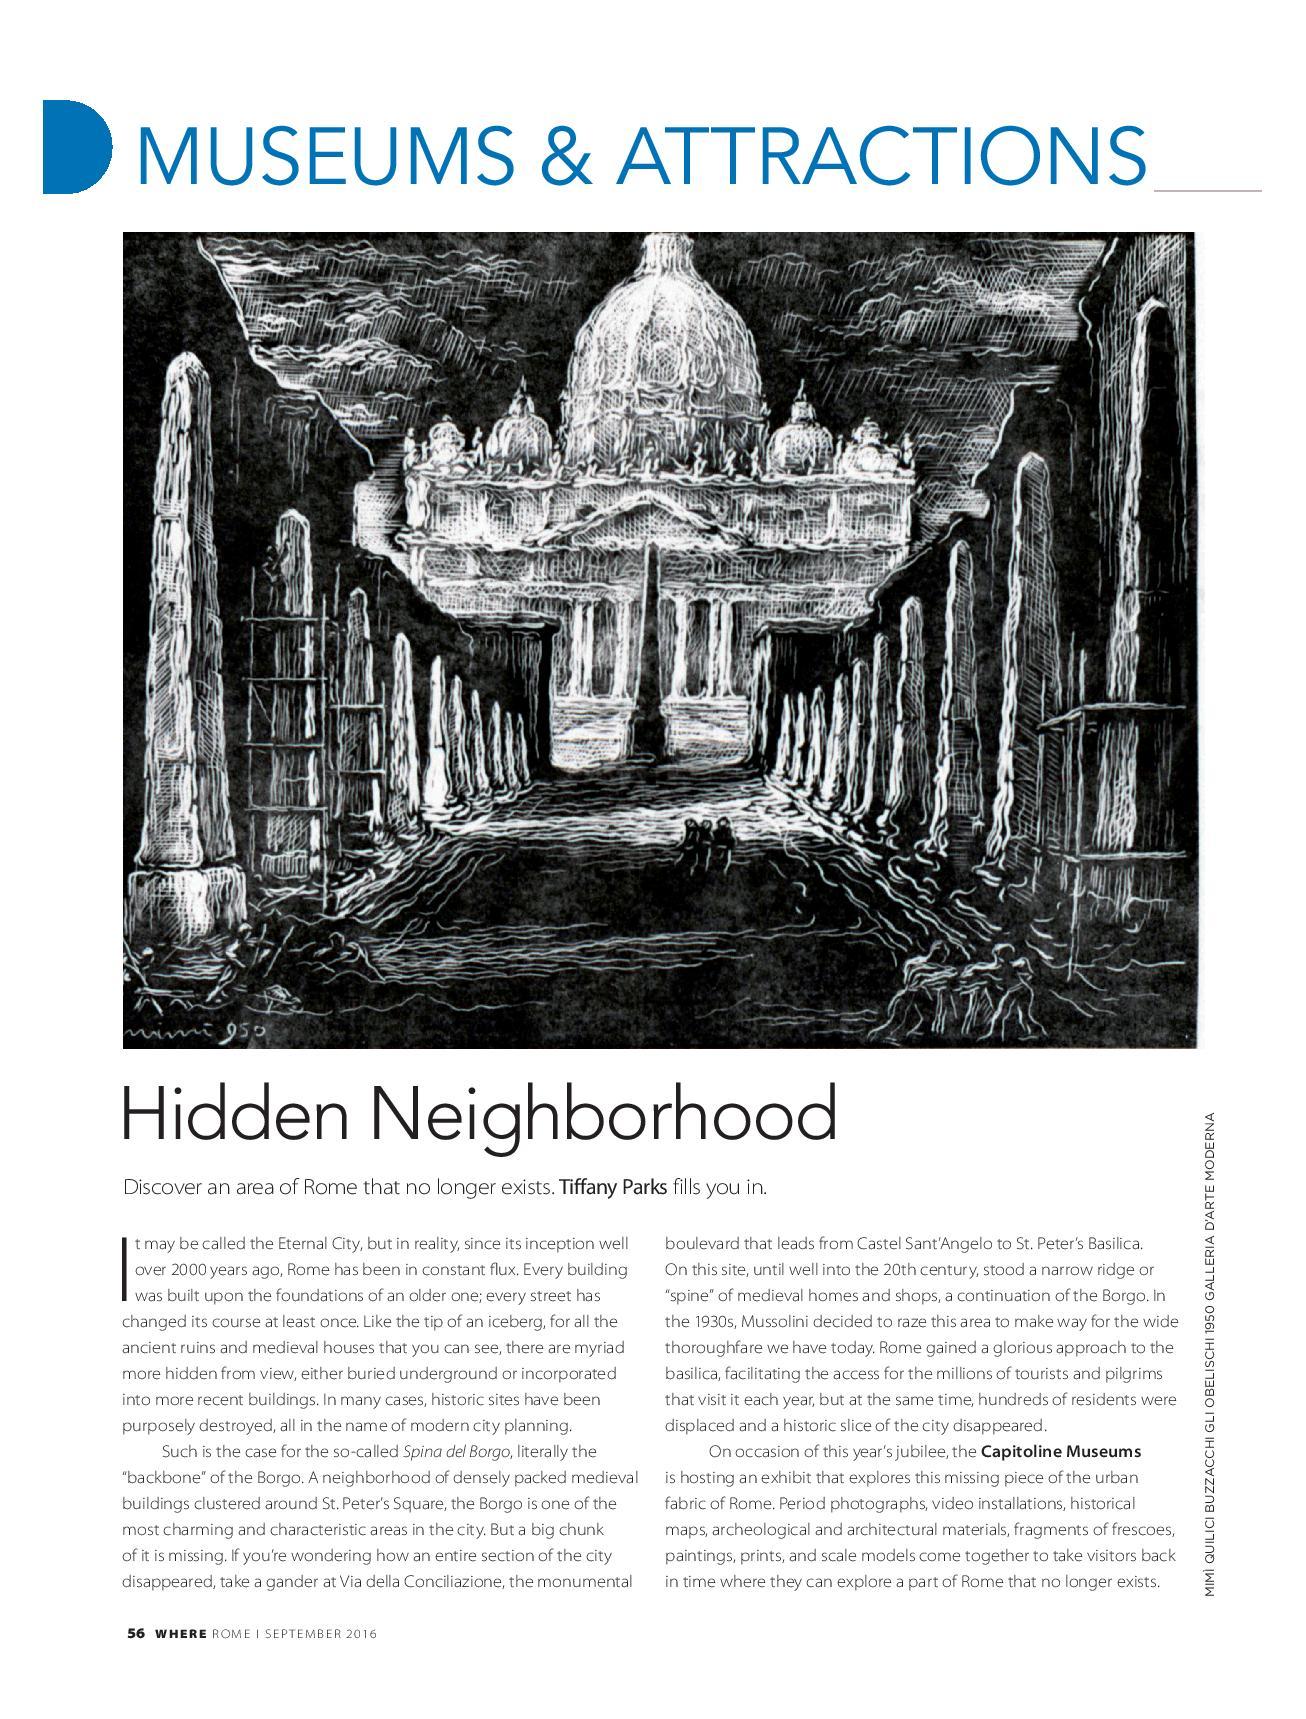 Hidden Neighborhood, September 2016-page-001.jpg